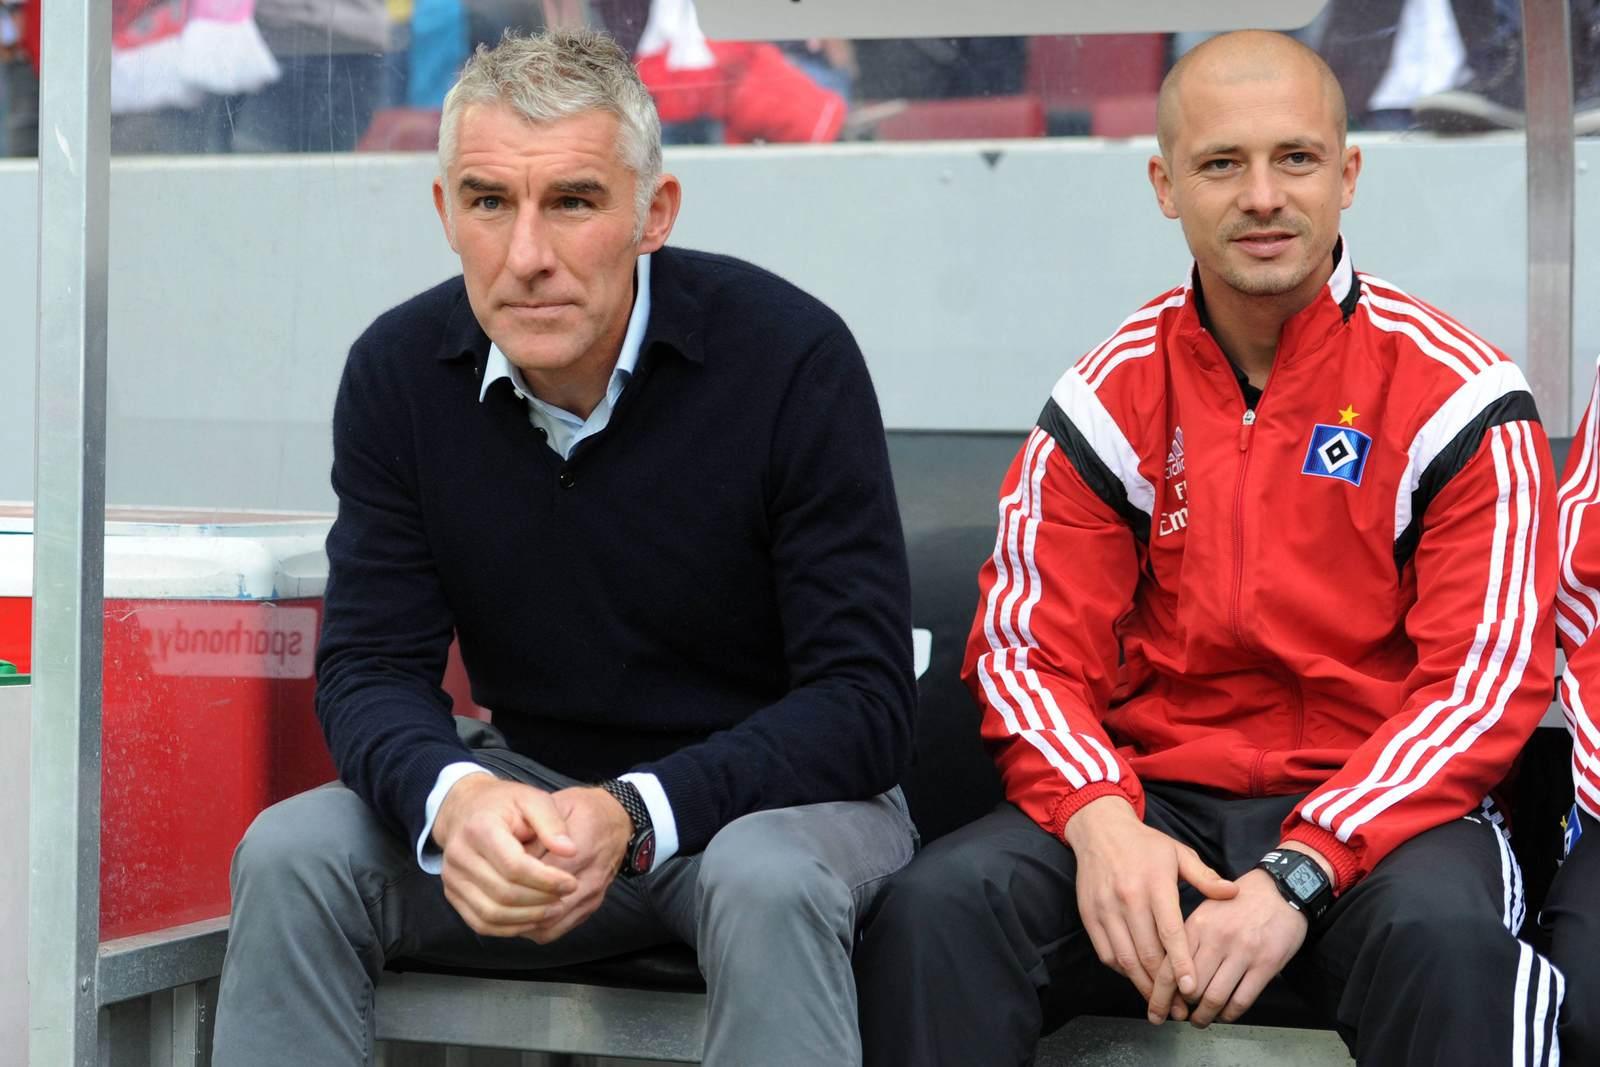 Mirko Slomka und Nestor El Maestro